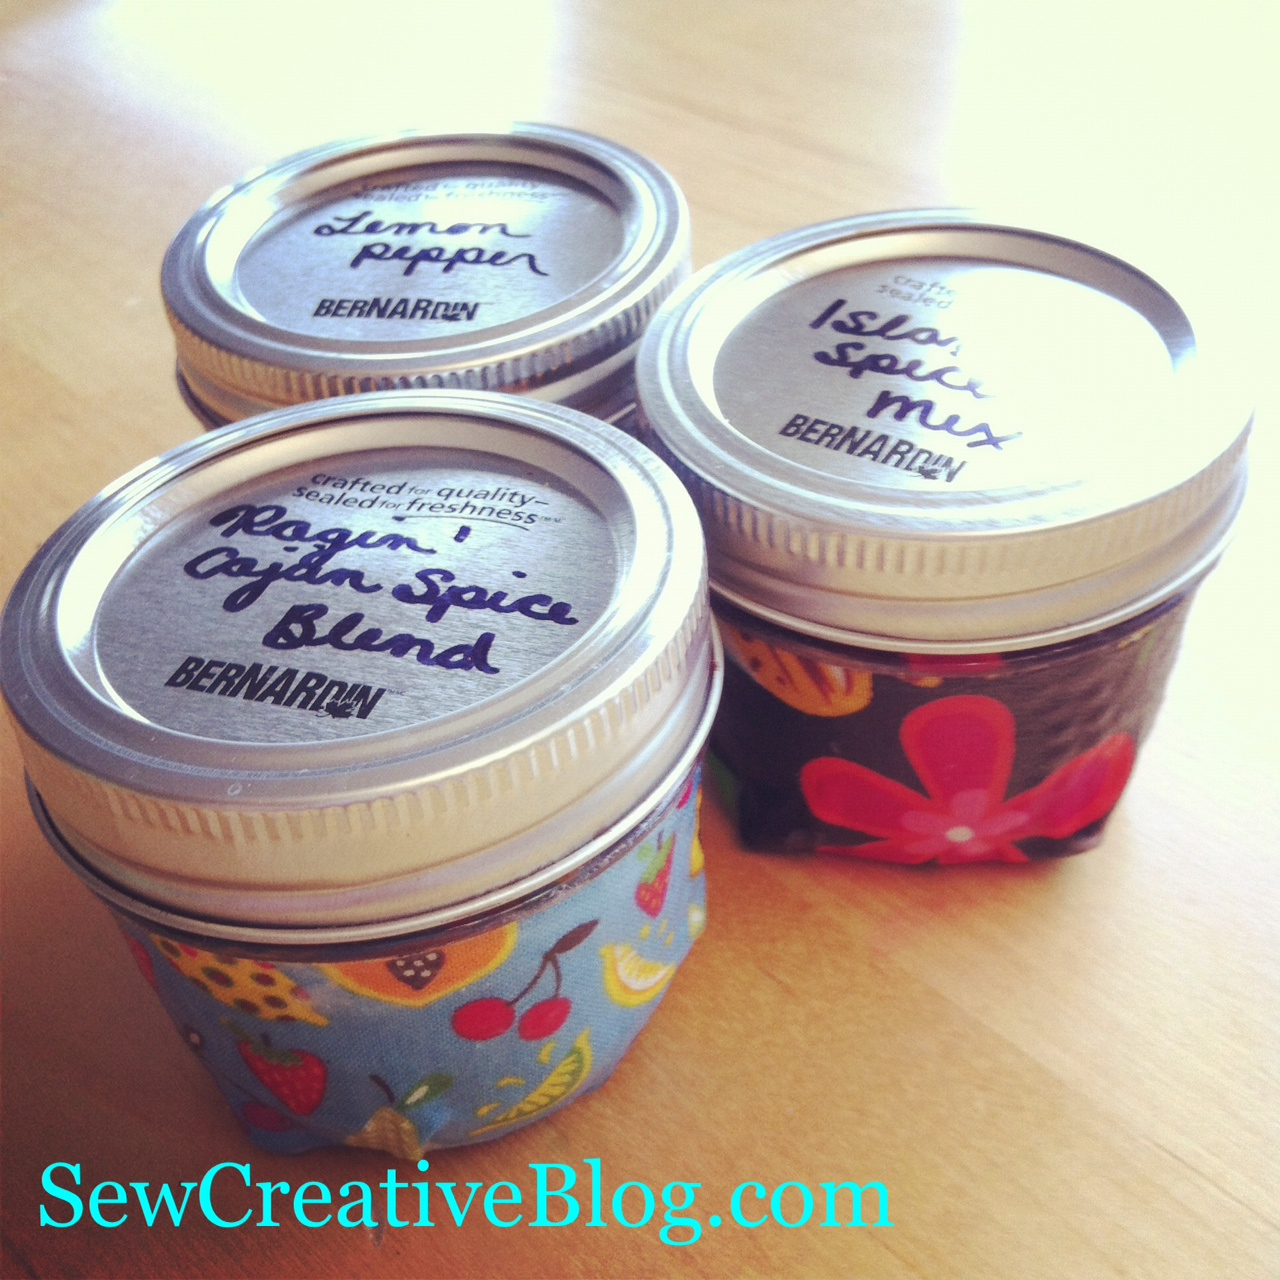 finished modge podge spice jars from SewCreativeBlog.com